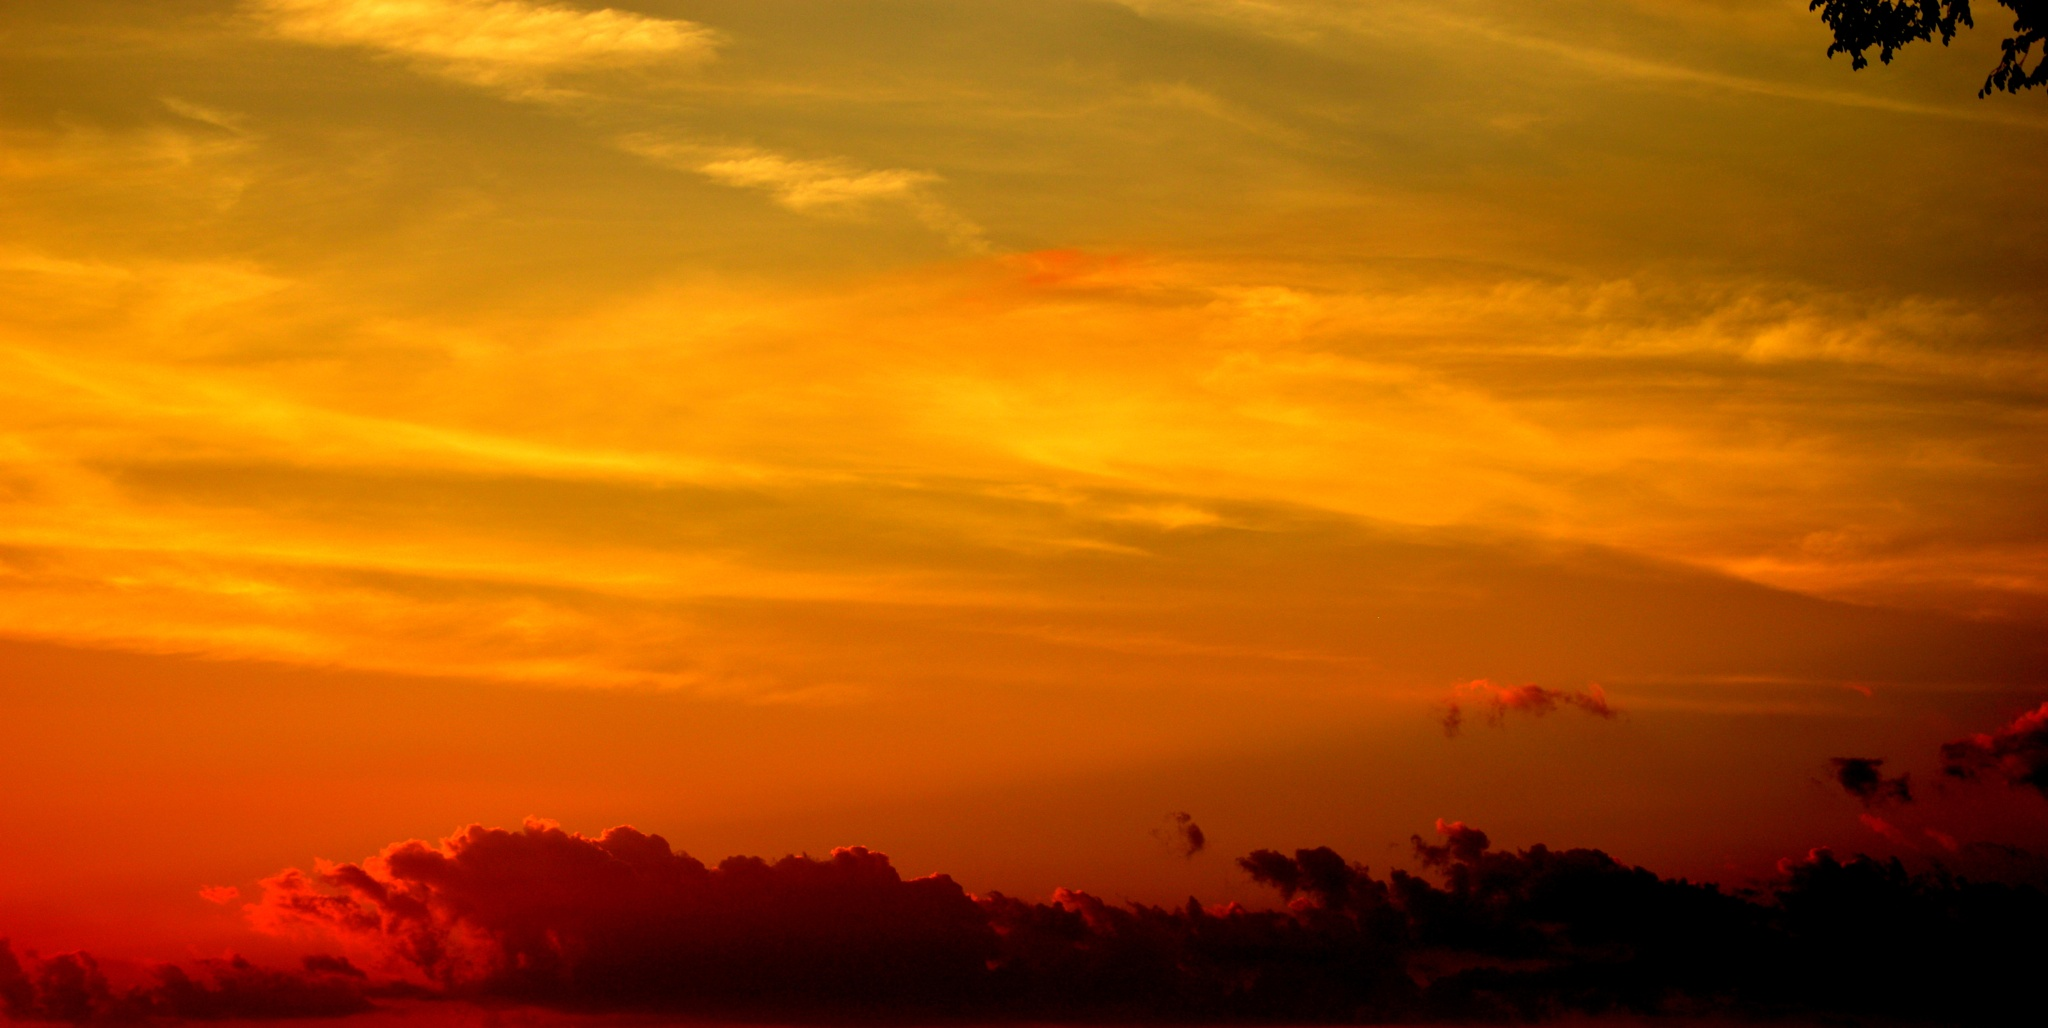 Sky at Sunset by SindeAnn